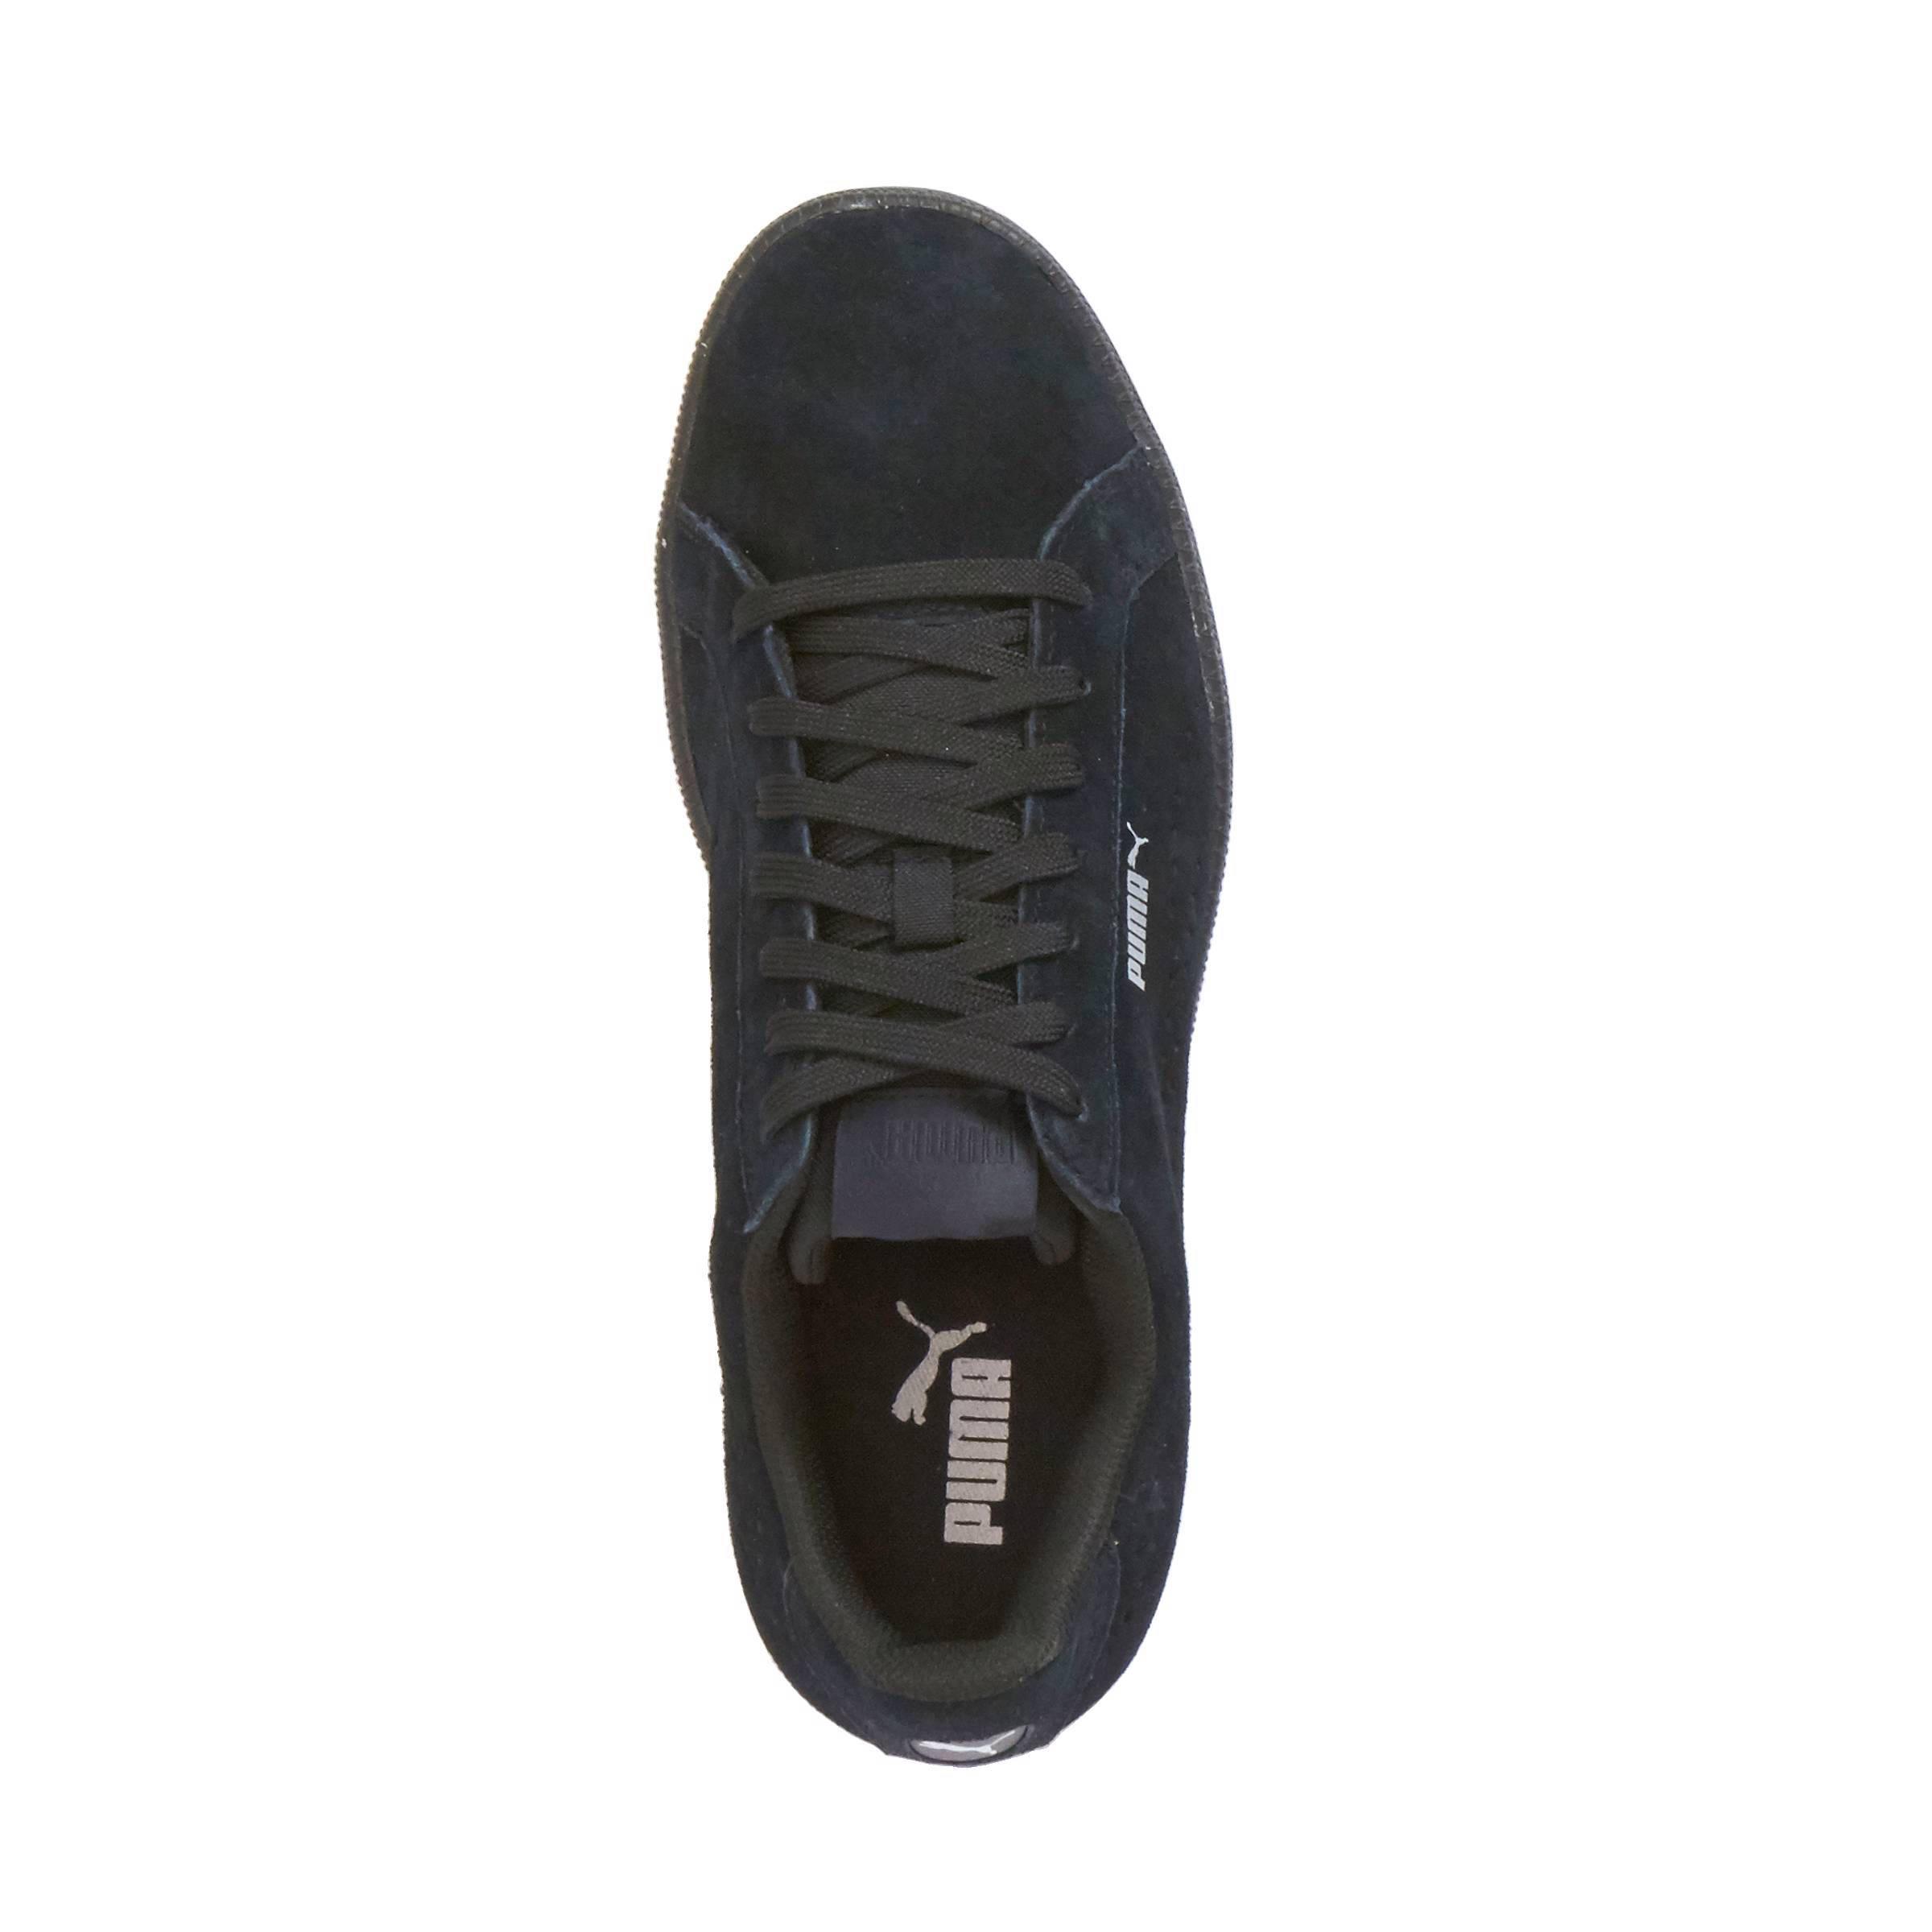 Smash Perf SD sneakers